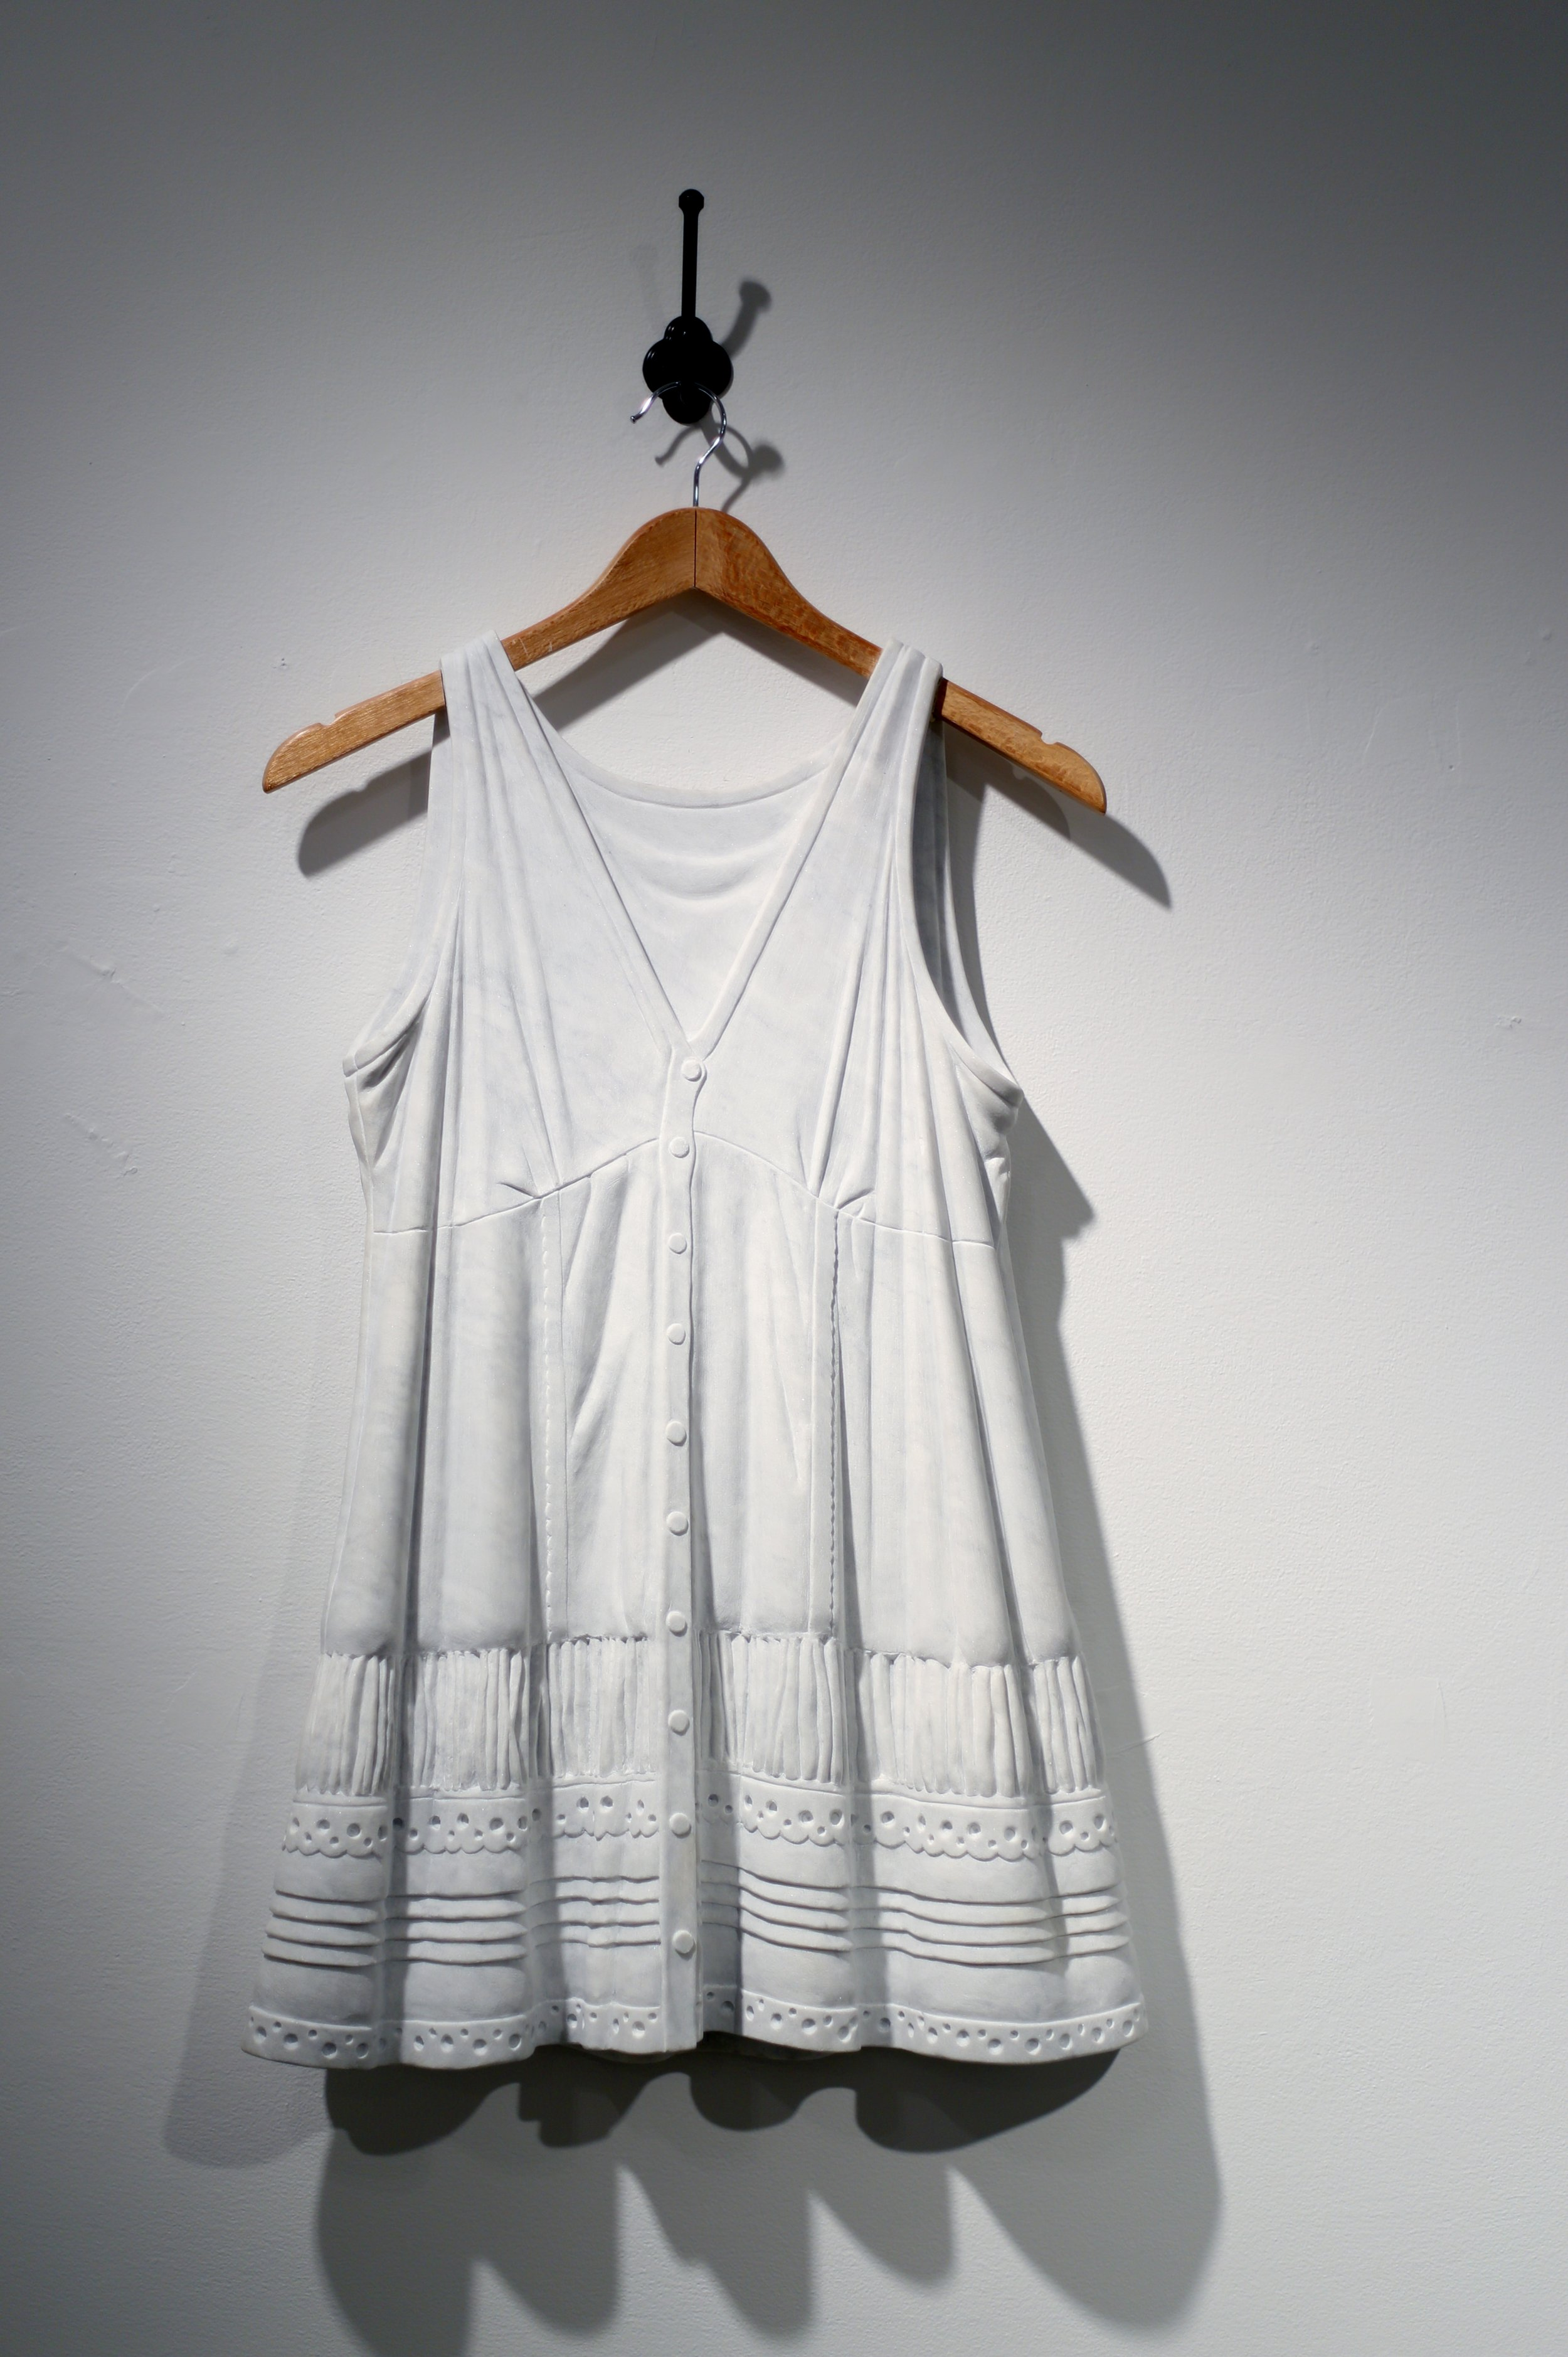 Alasdair-Thomson-Marble-Dress-Sculpture.jpg